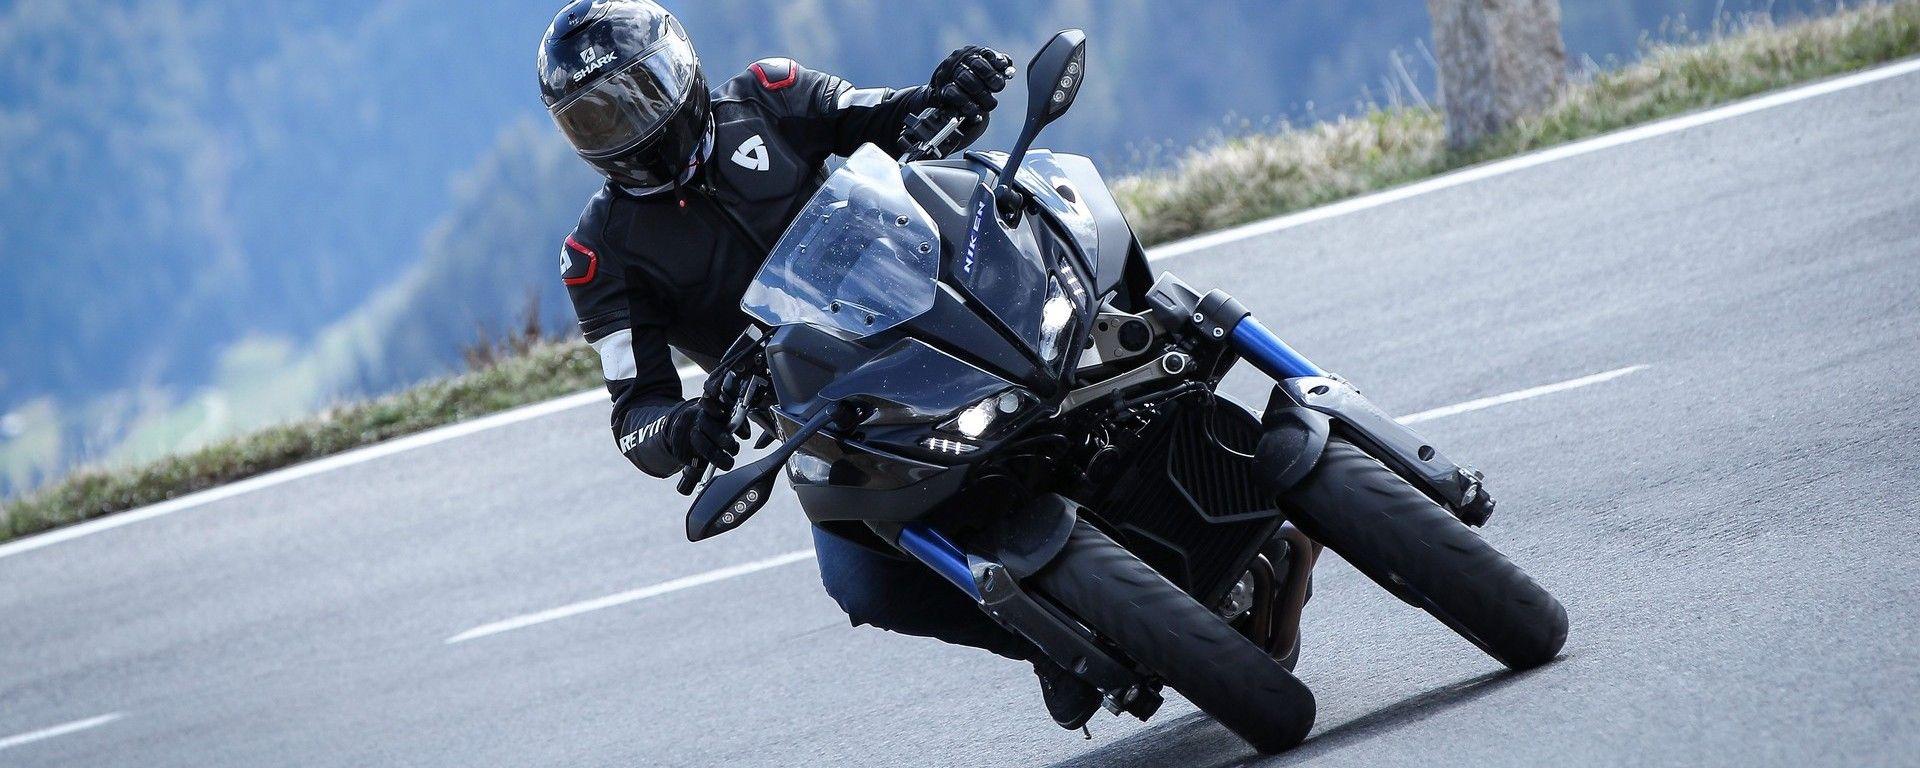 Yamaha Niken 850: la nuova moto a 3 ruote